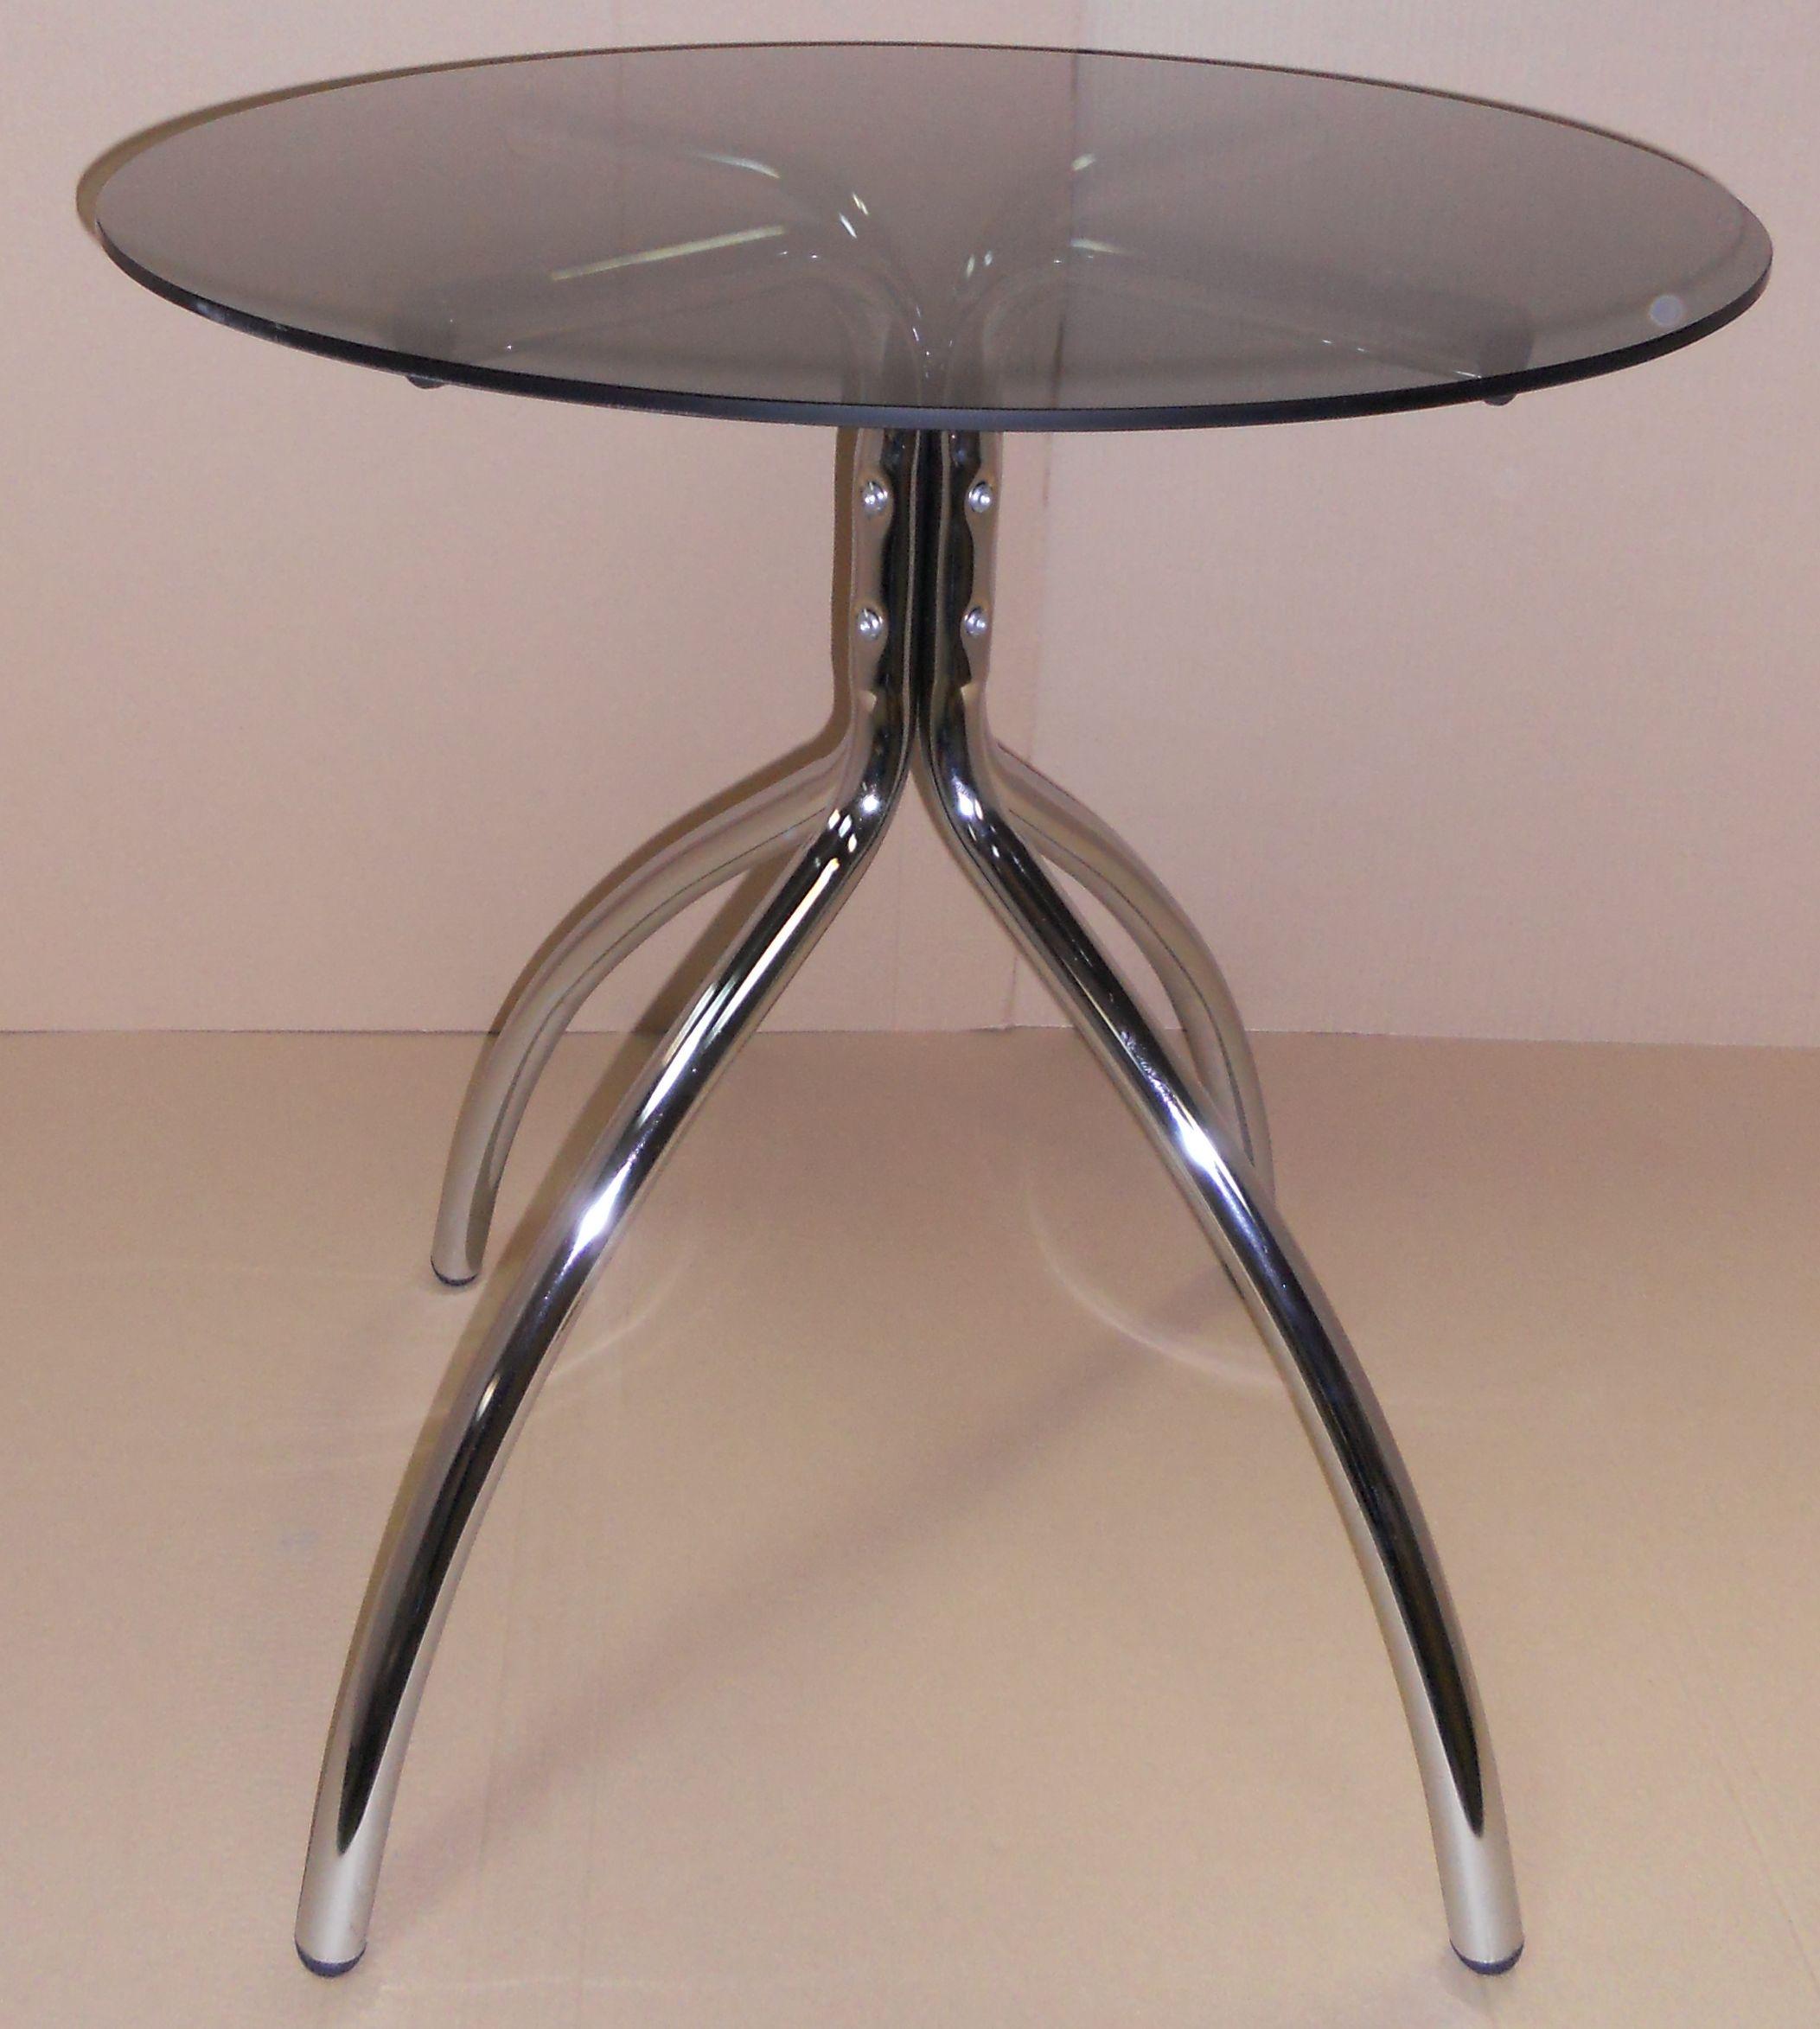 Необычный стол на четырёх ножках